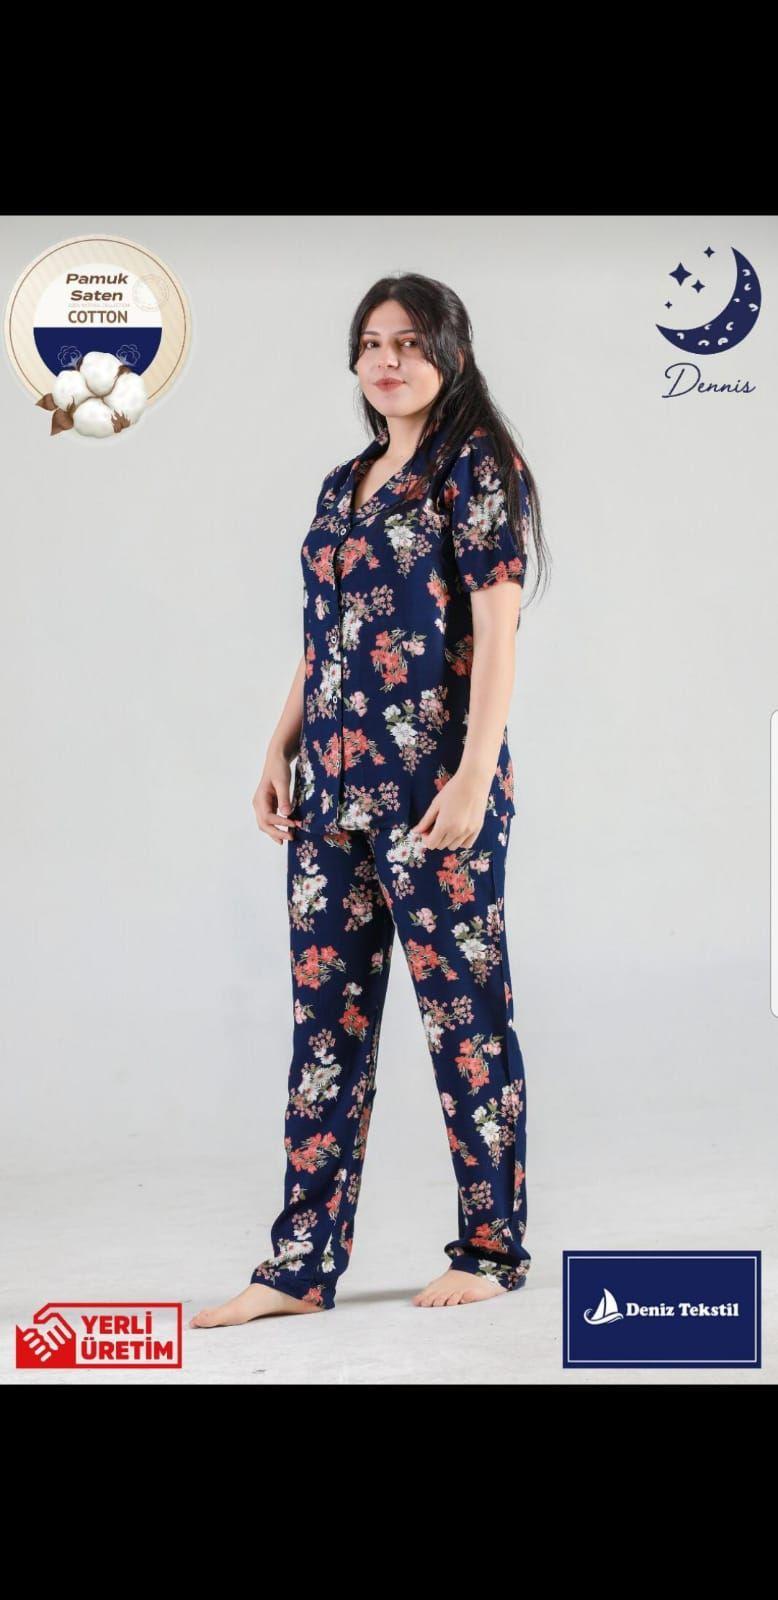 #pijama #pamuksaten #lohusa